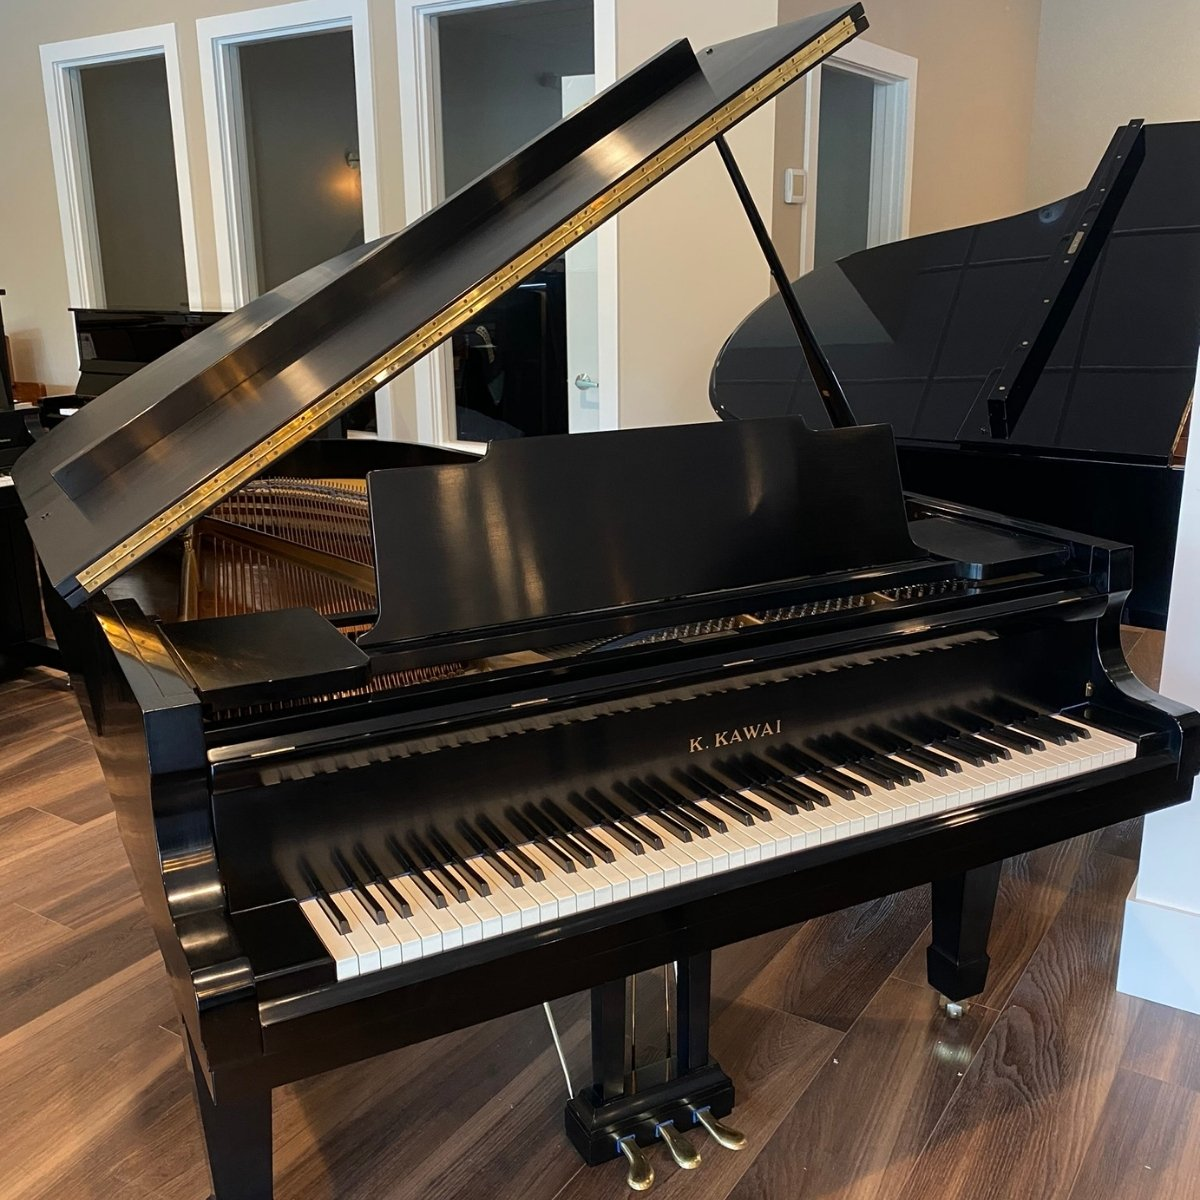 RENTED - Kawai 6'7 Model KG-5 Grand Piano